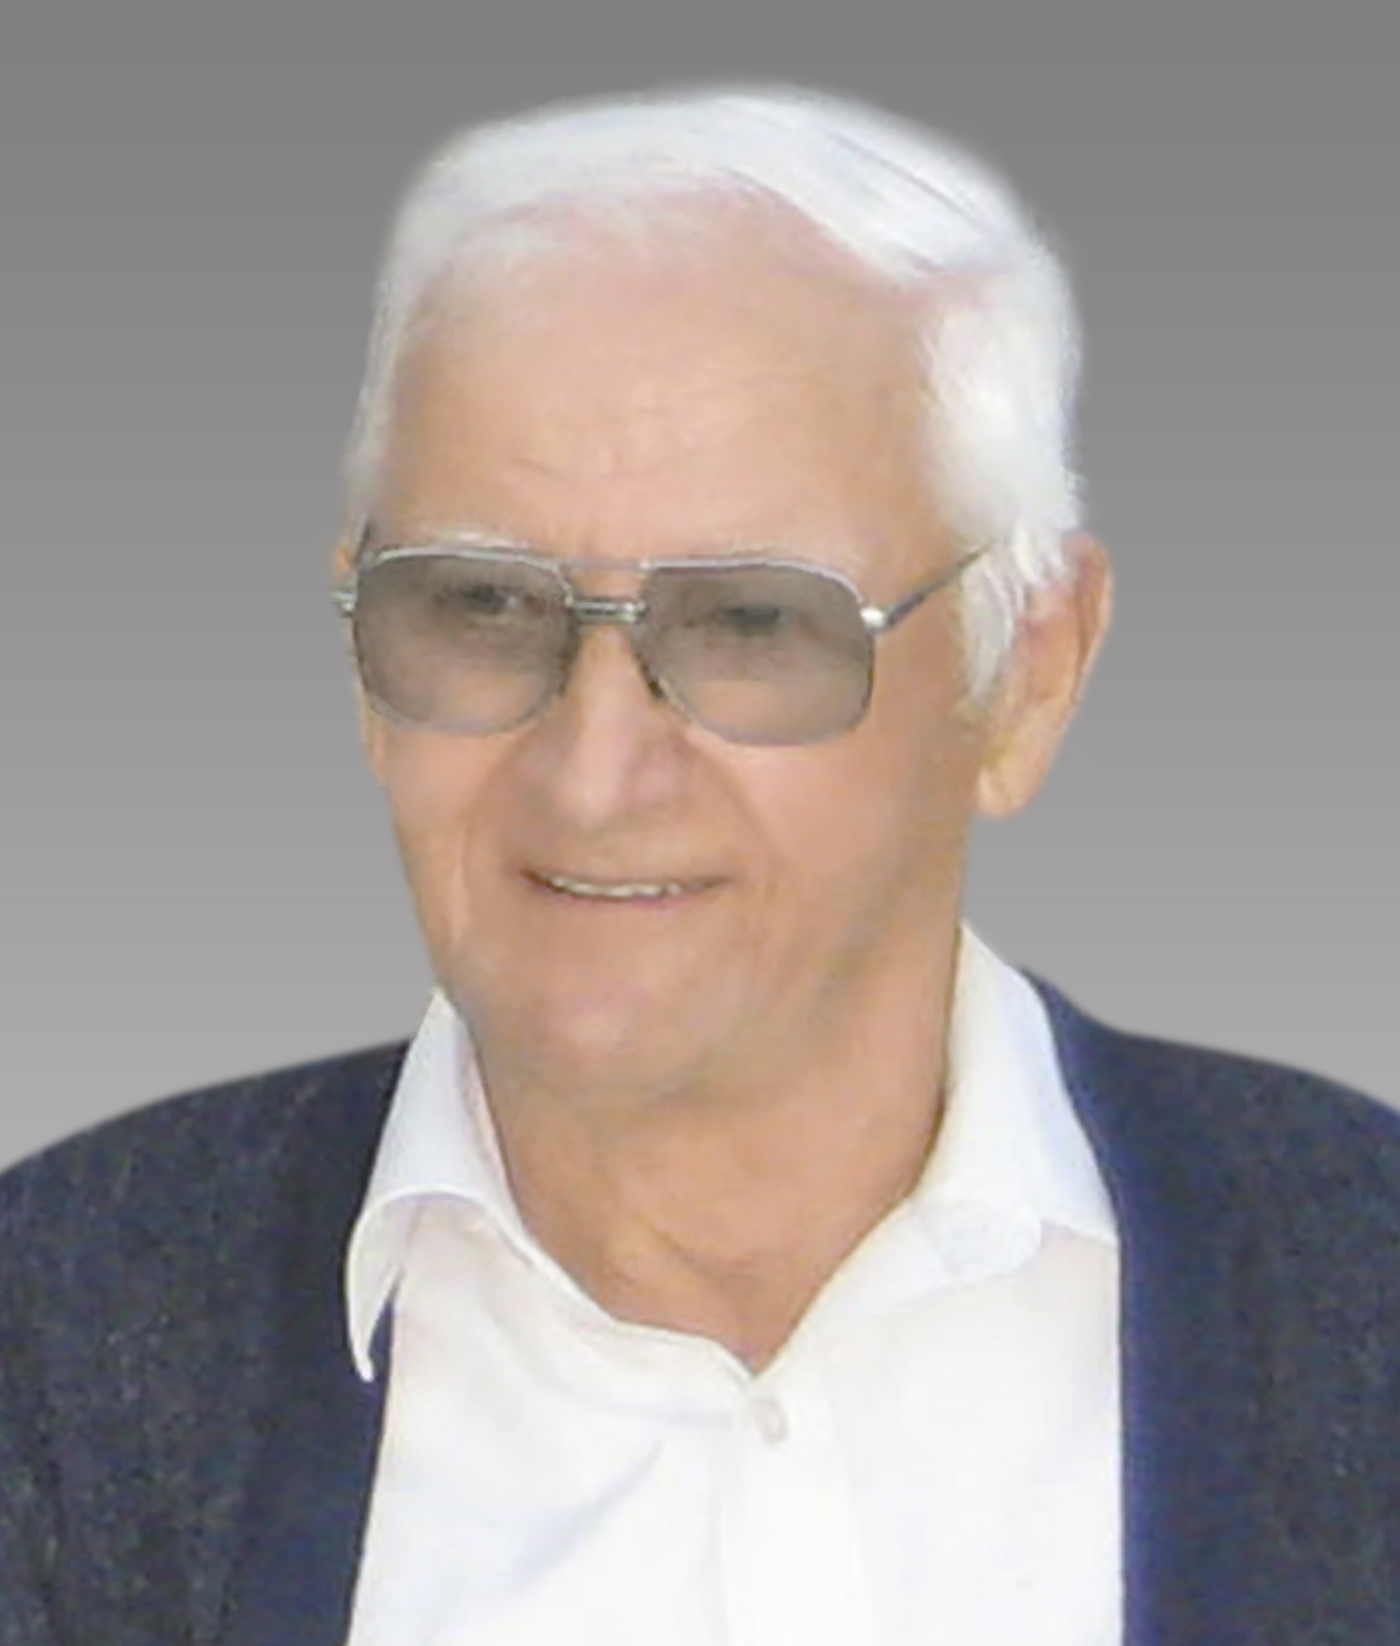 Jean-Paul Chouinard